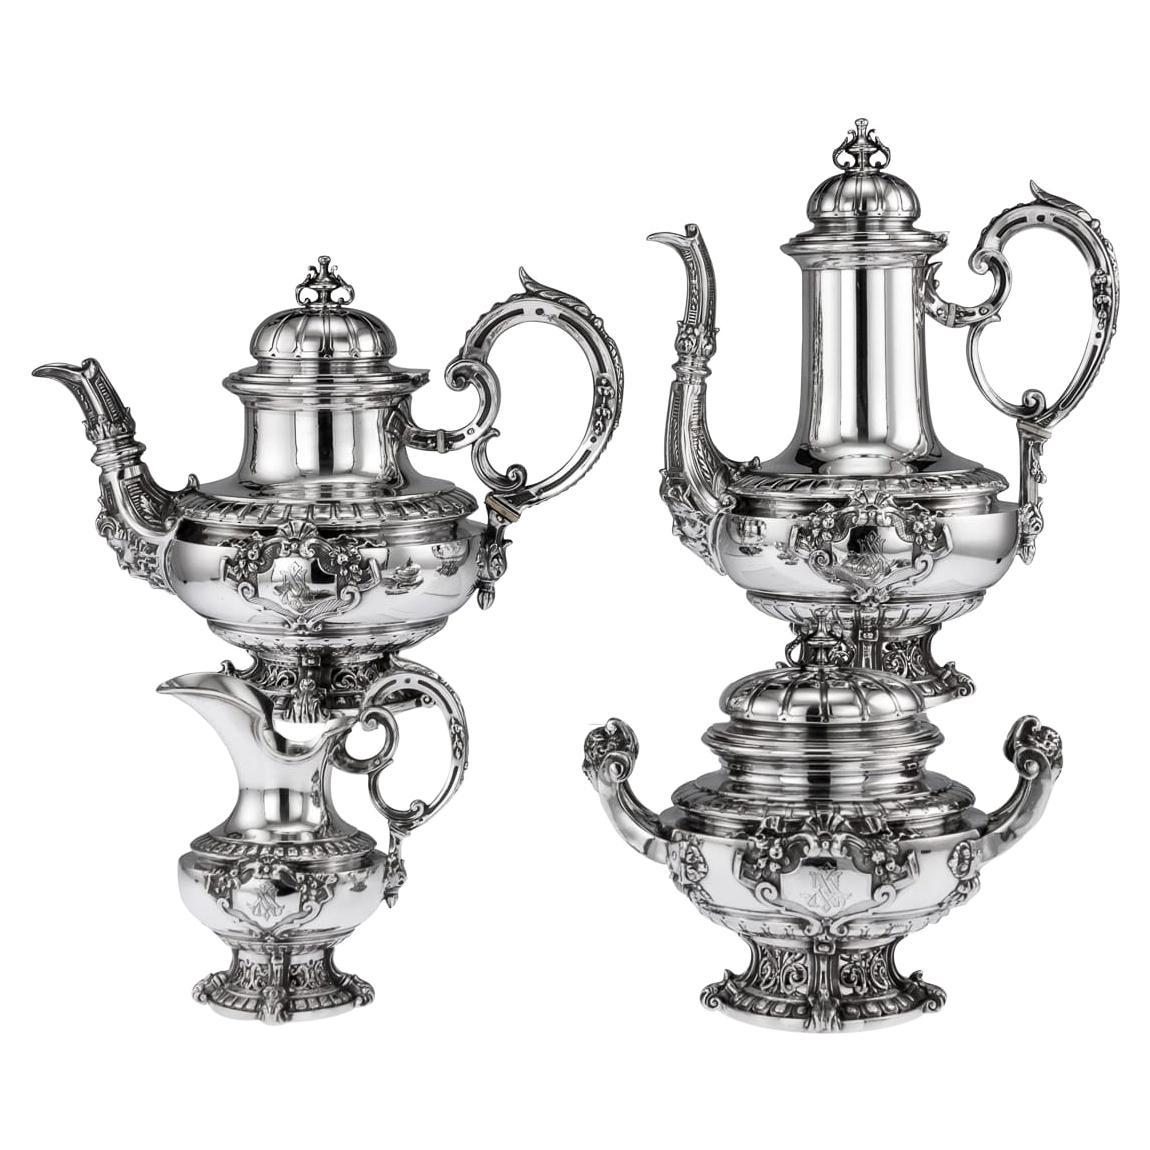 19th Century French Empire Solid Silver Tea Service, Alphonse Debain, circa 1890